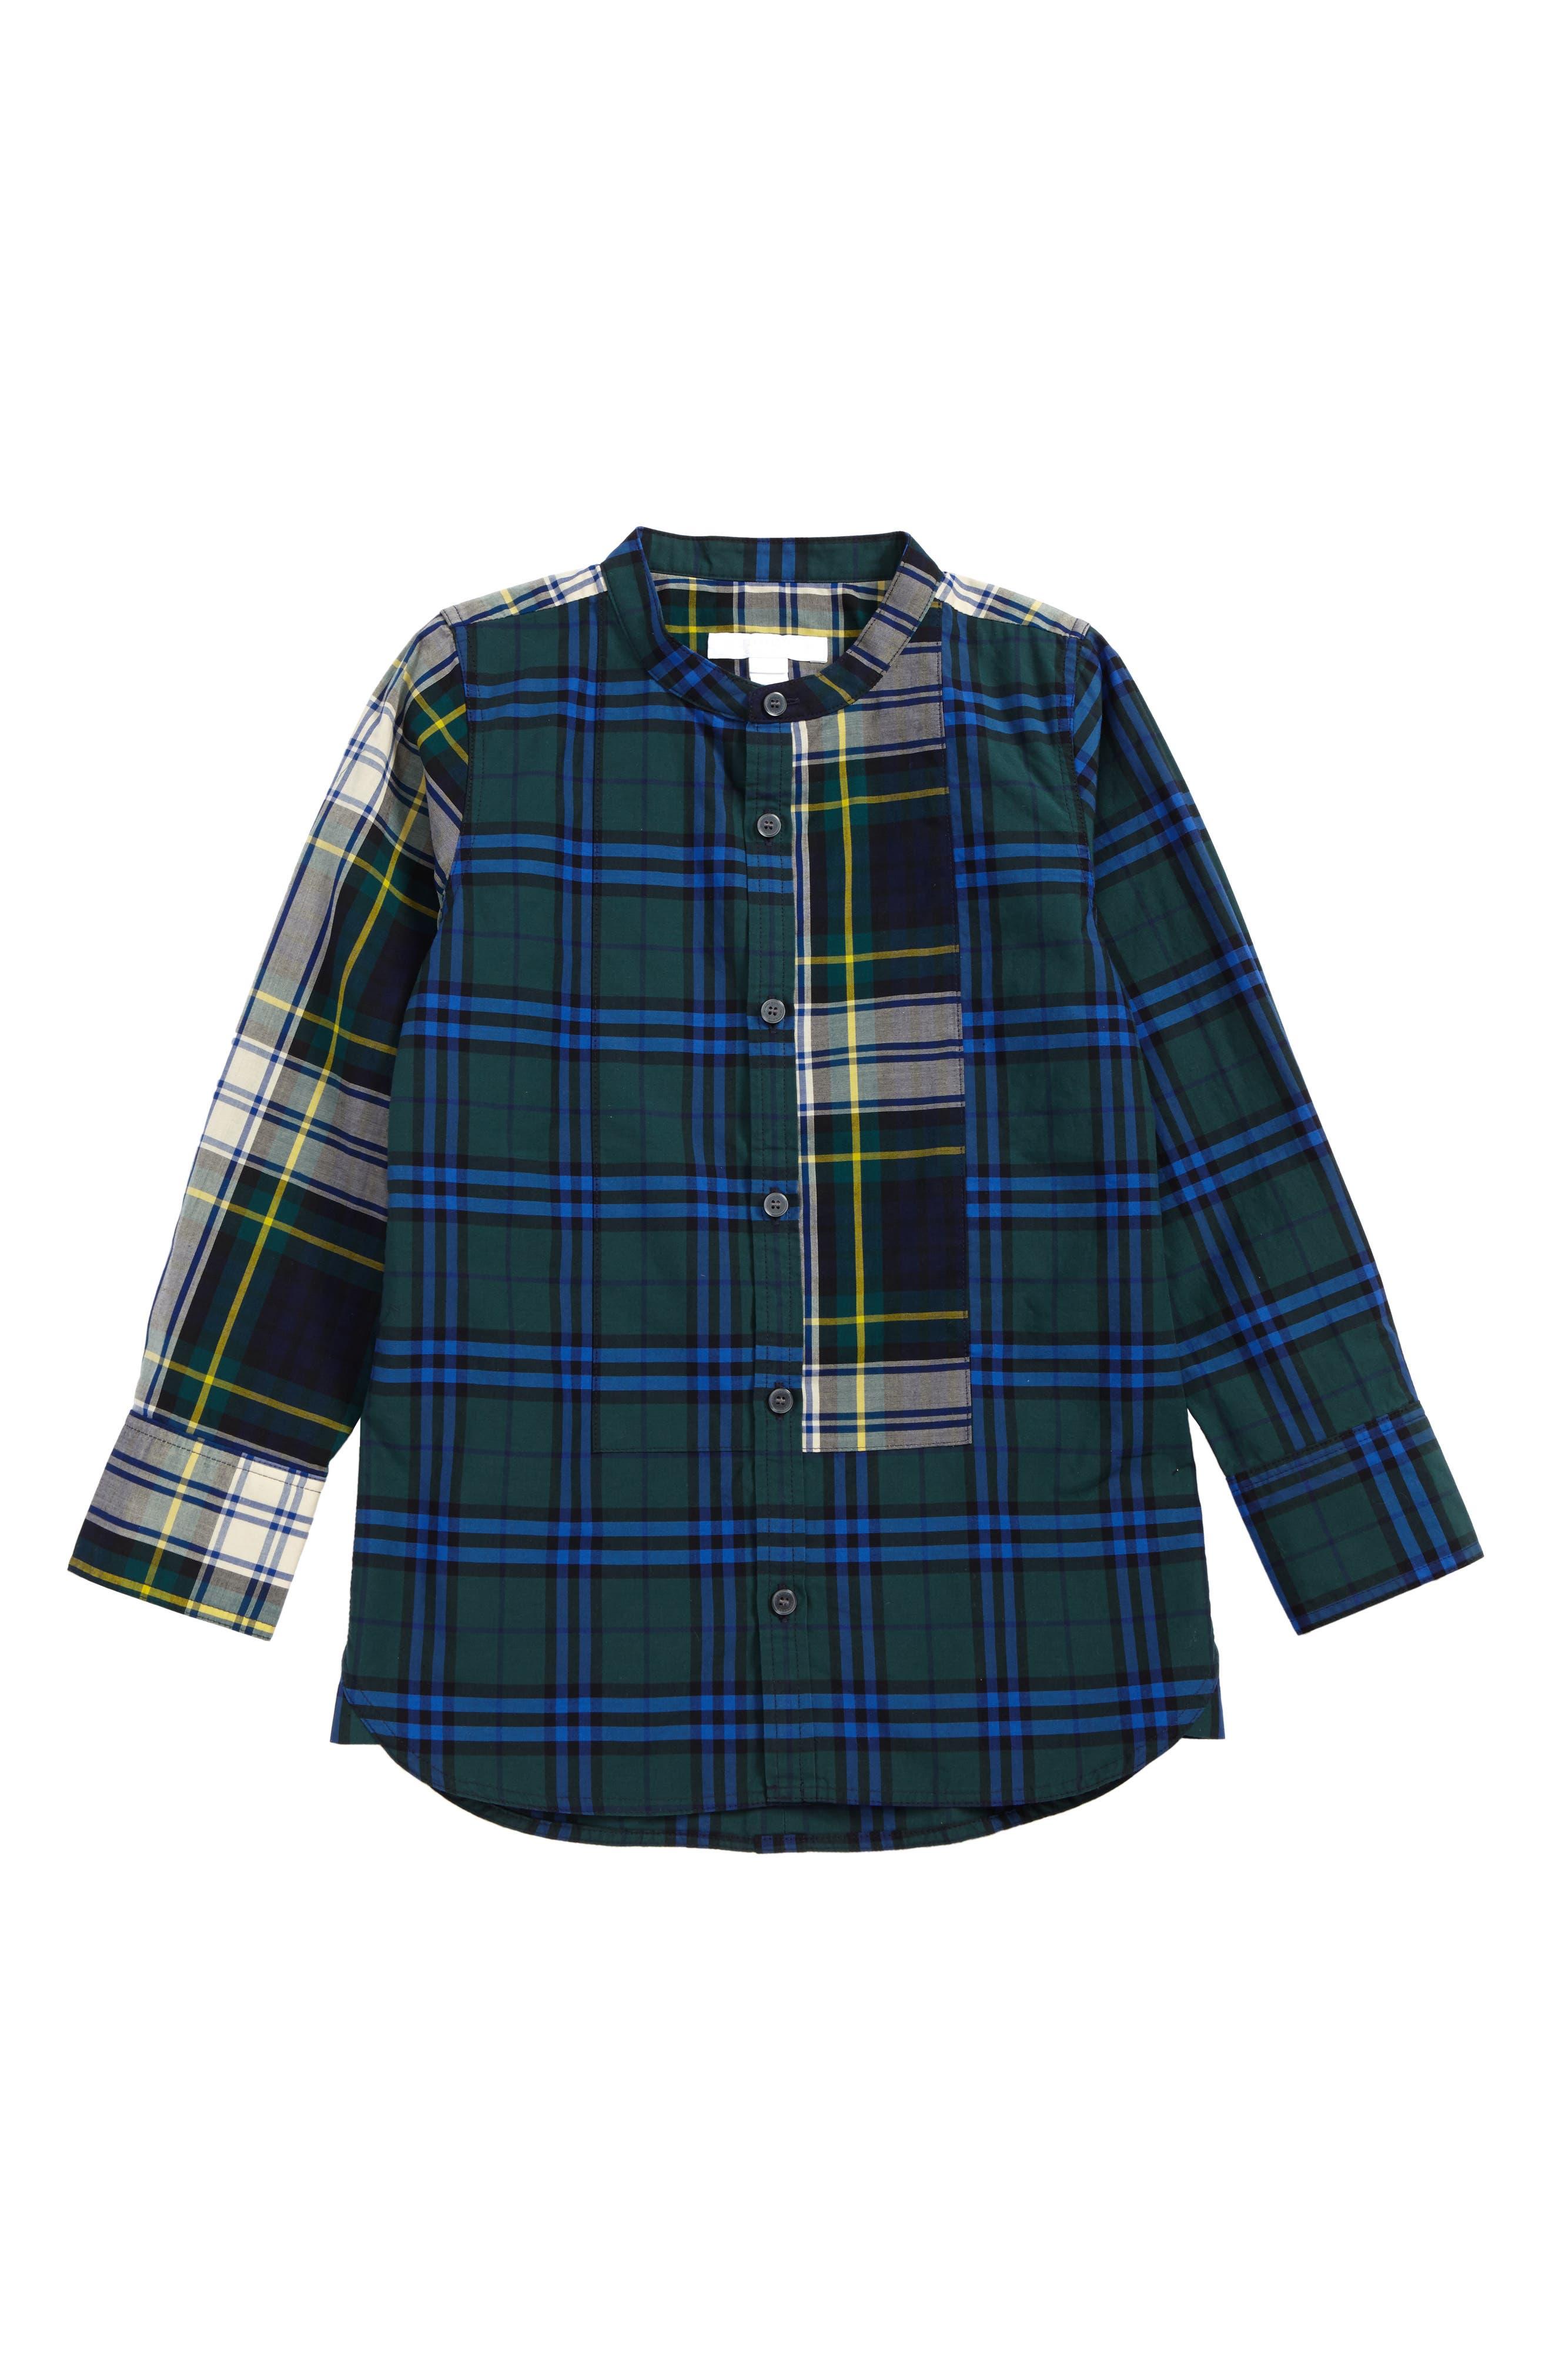 Baby Burberry Shirt Sale